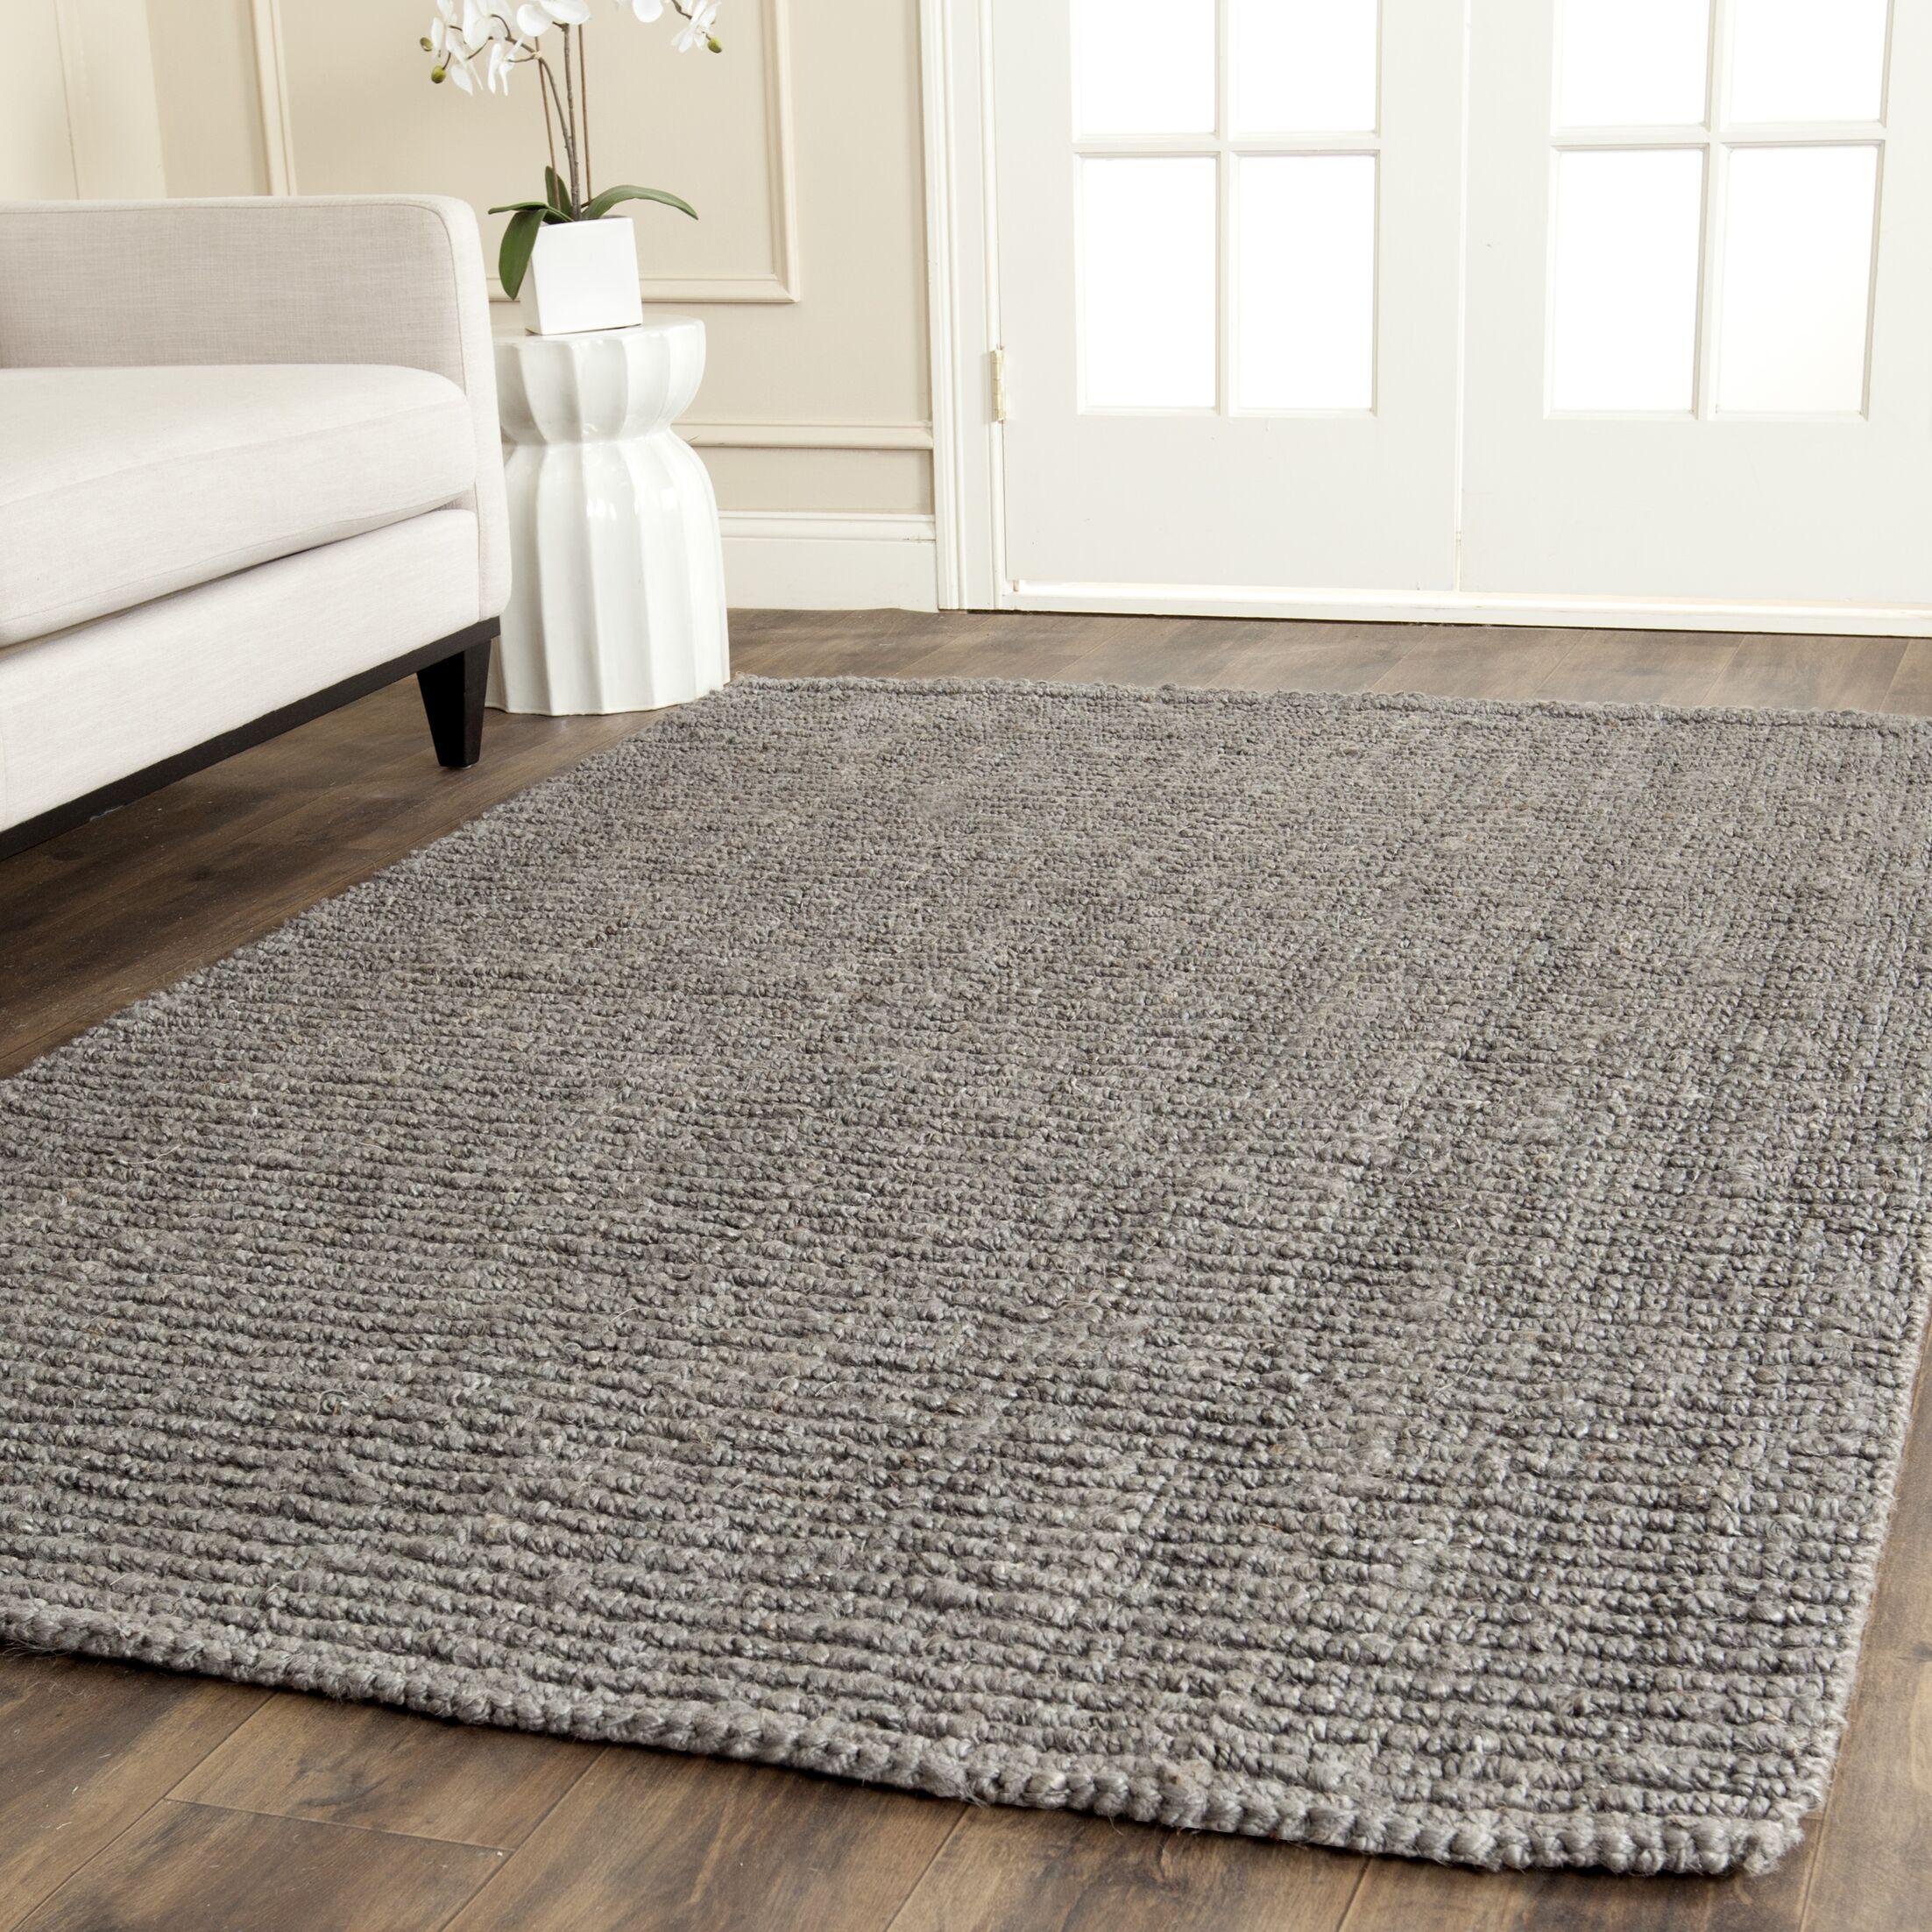 Greene Hand-Woven Gray Indoor Area Rug Rug Size: Rectangle 10' x 14'